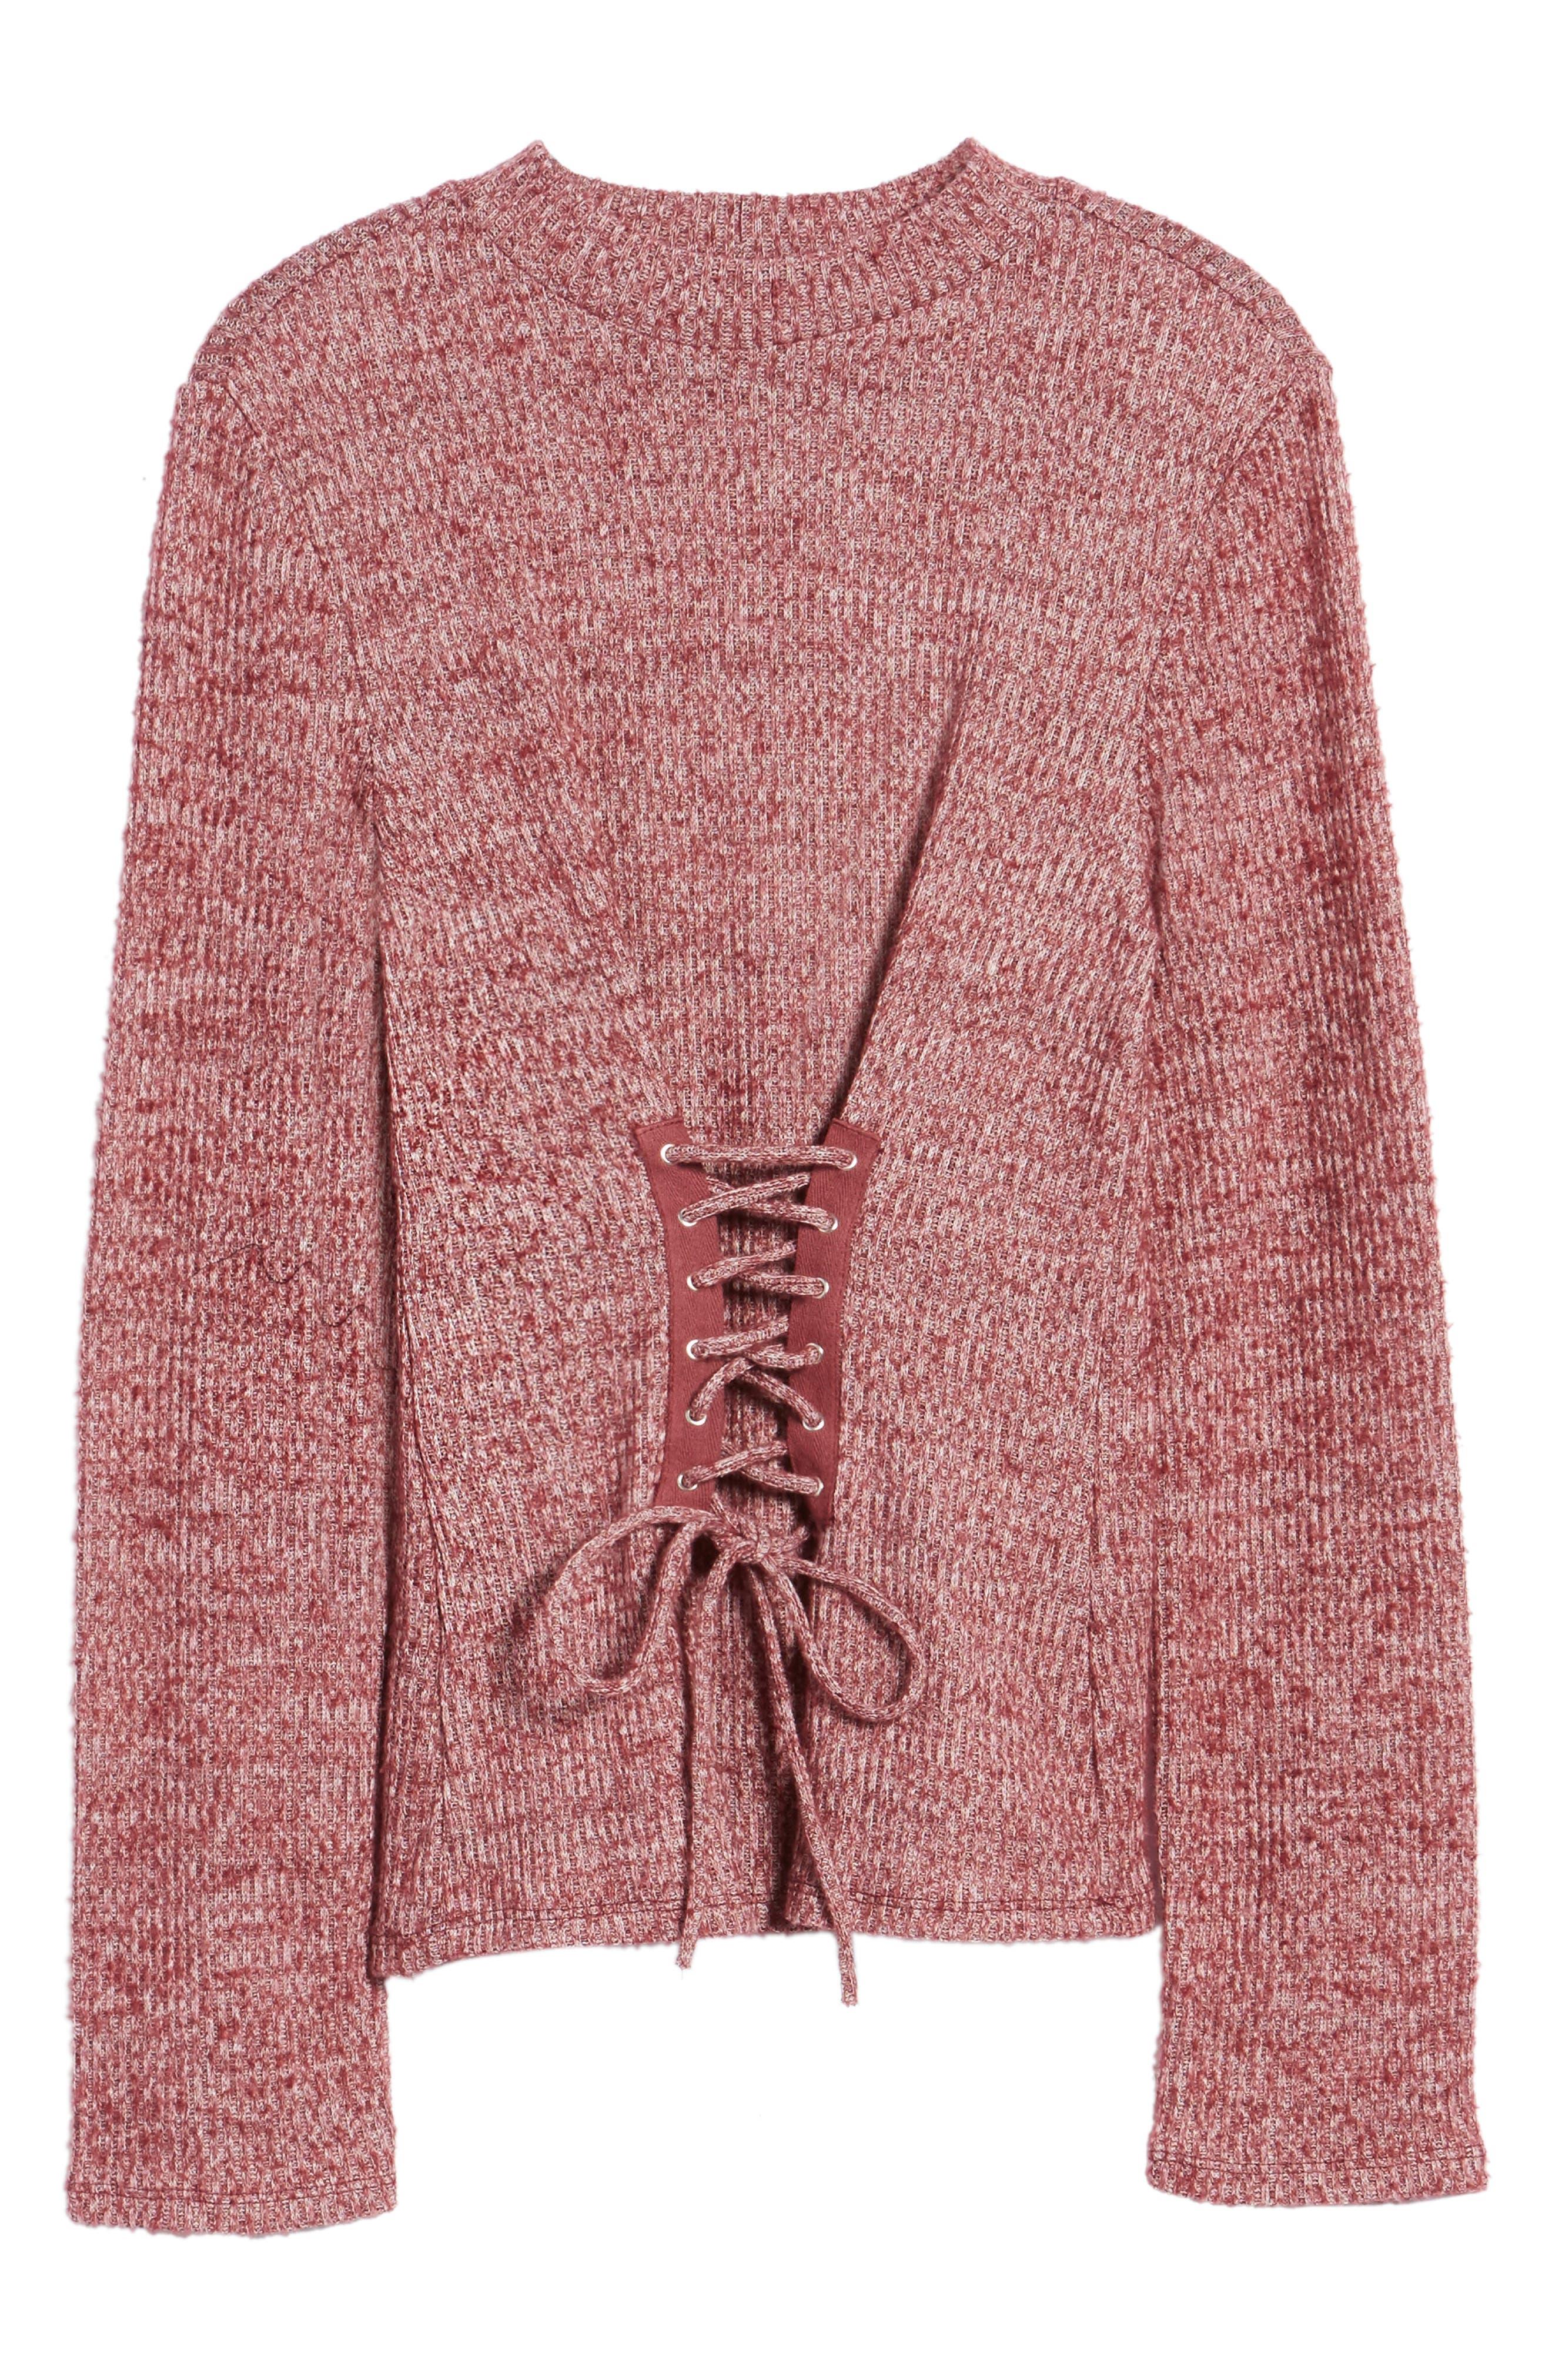 Rib Knit Corset Top,                             Alternate thumbnail 6, color,                             Burgundy Royale